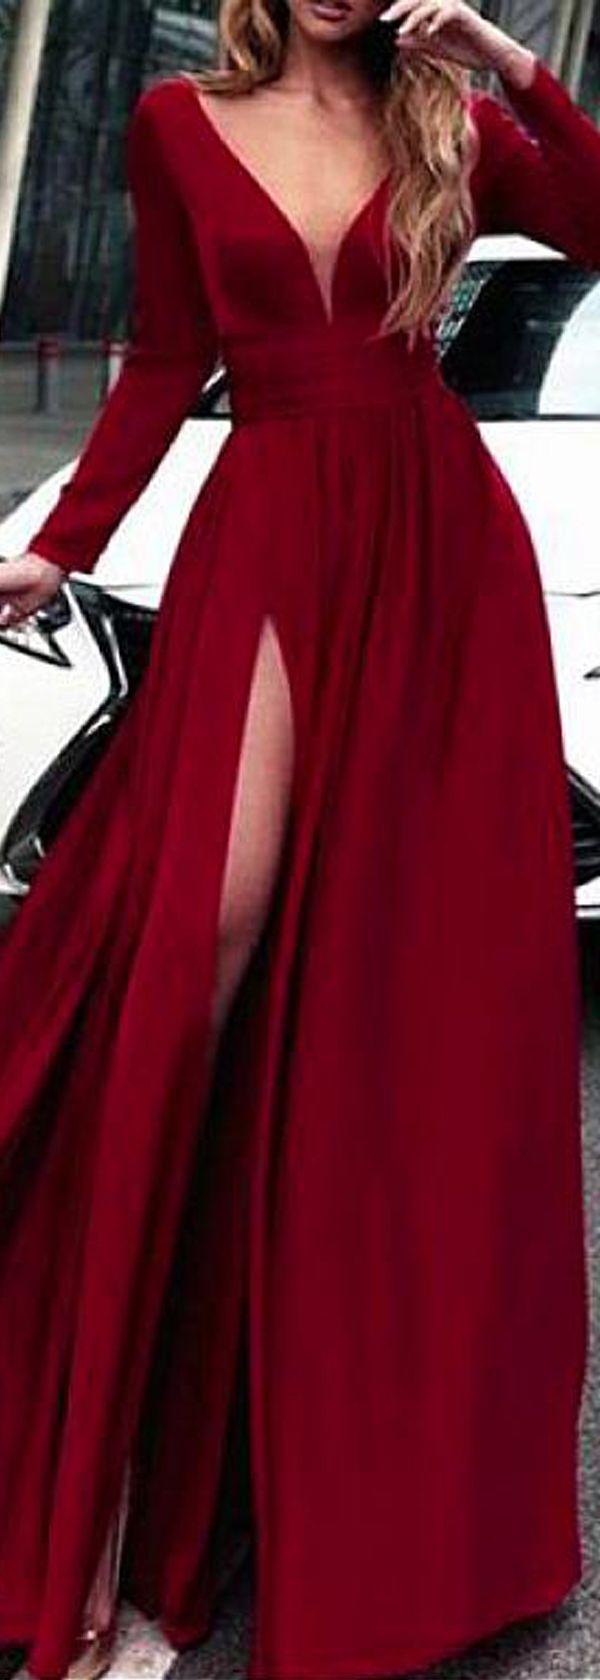 best prom dresses images on pinterest